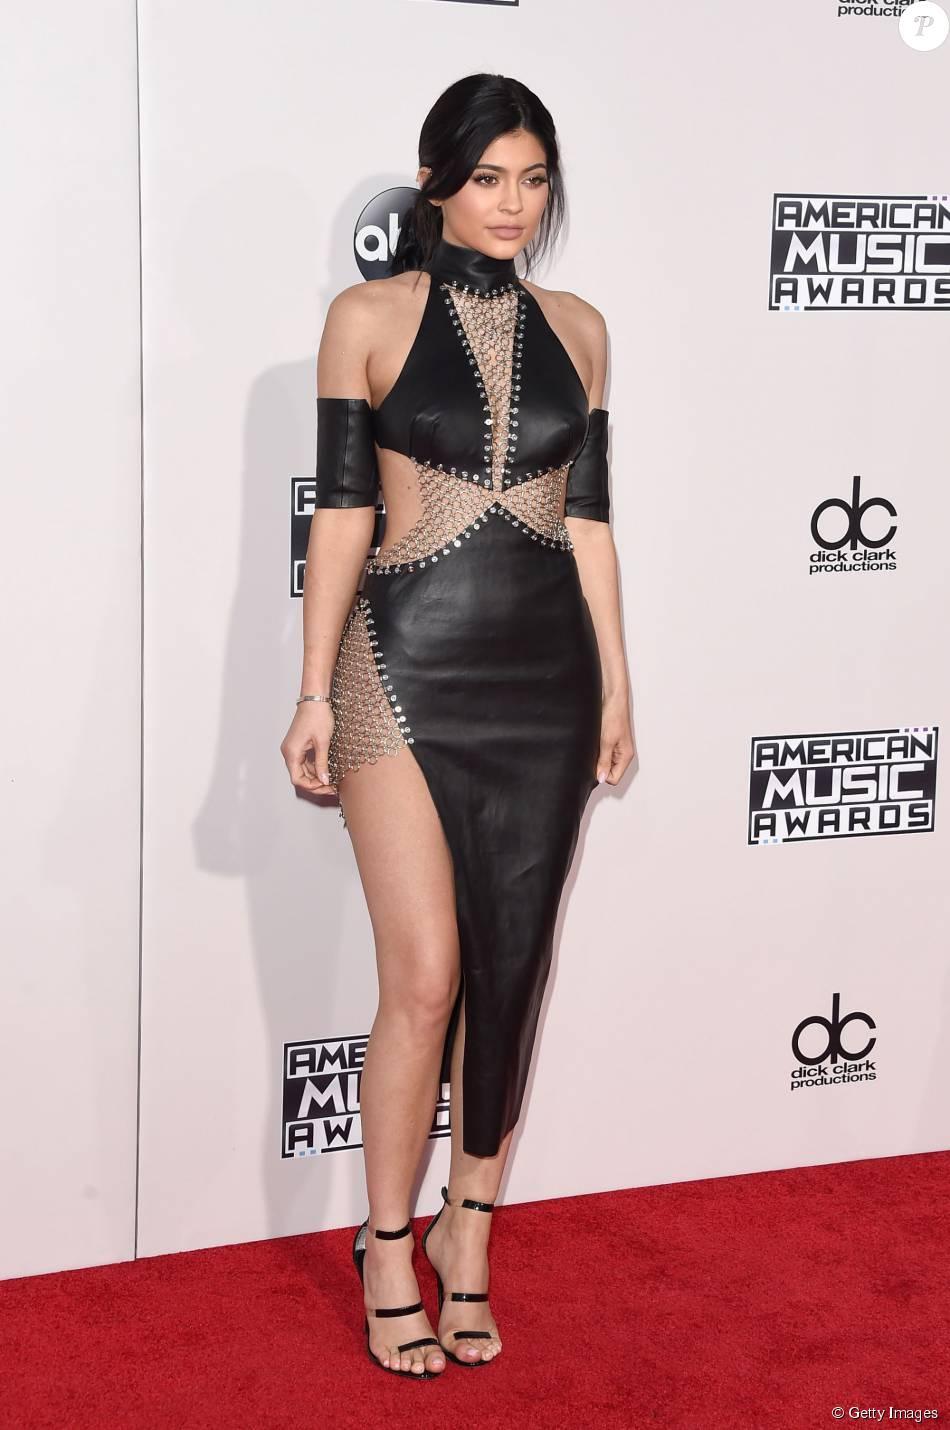 Kylie Jenner Usou Um Vestido Da Grife Bryan Hearns No